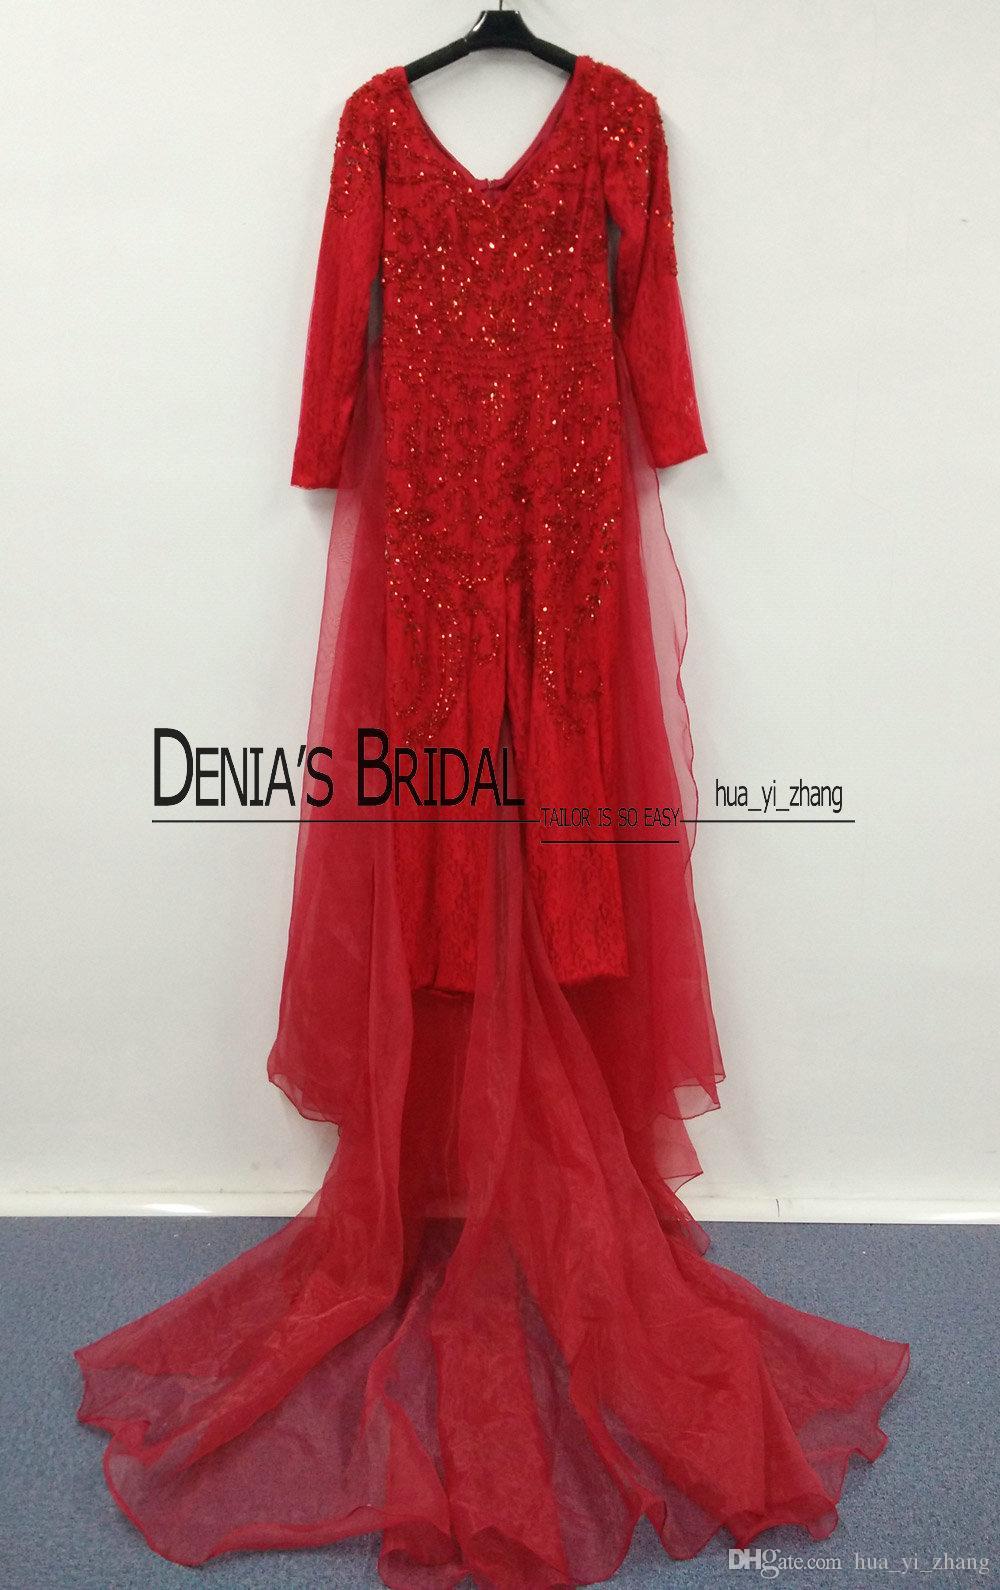 Immagine reale Myriam Fares Tuta con organza maniche lunghe maniche lunghe Blingbling Beaded 2016 Sweep Train Celebrity Gowns